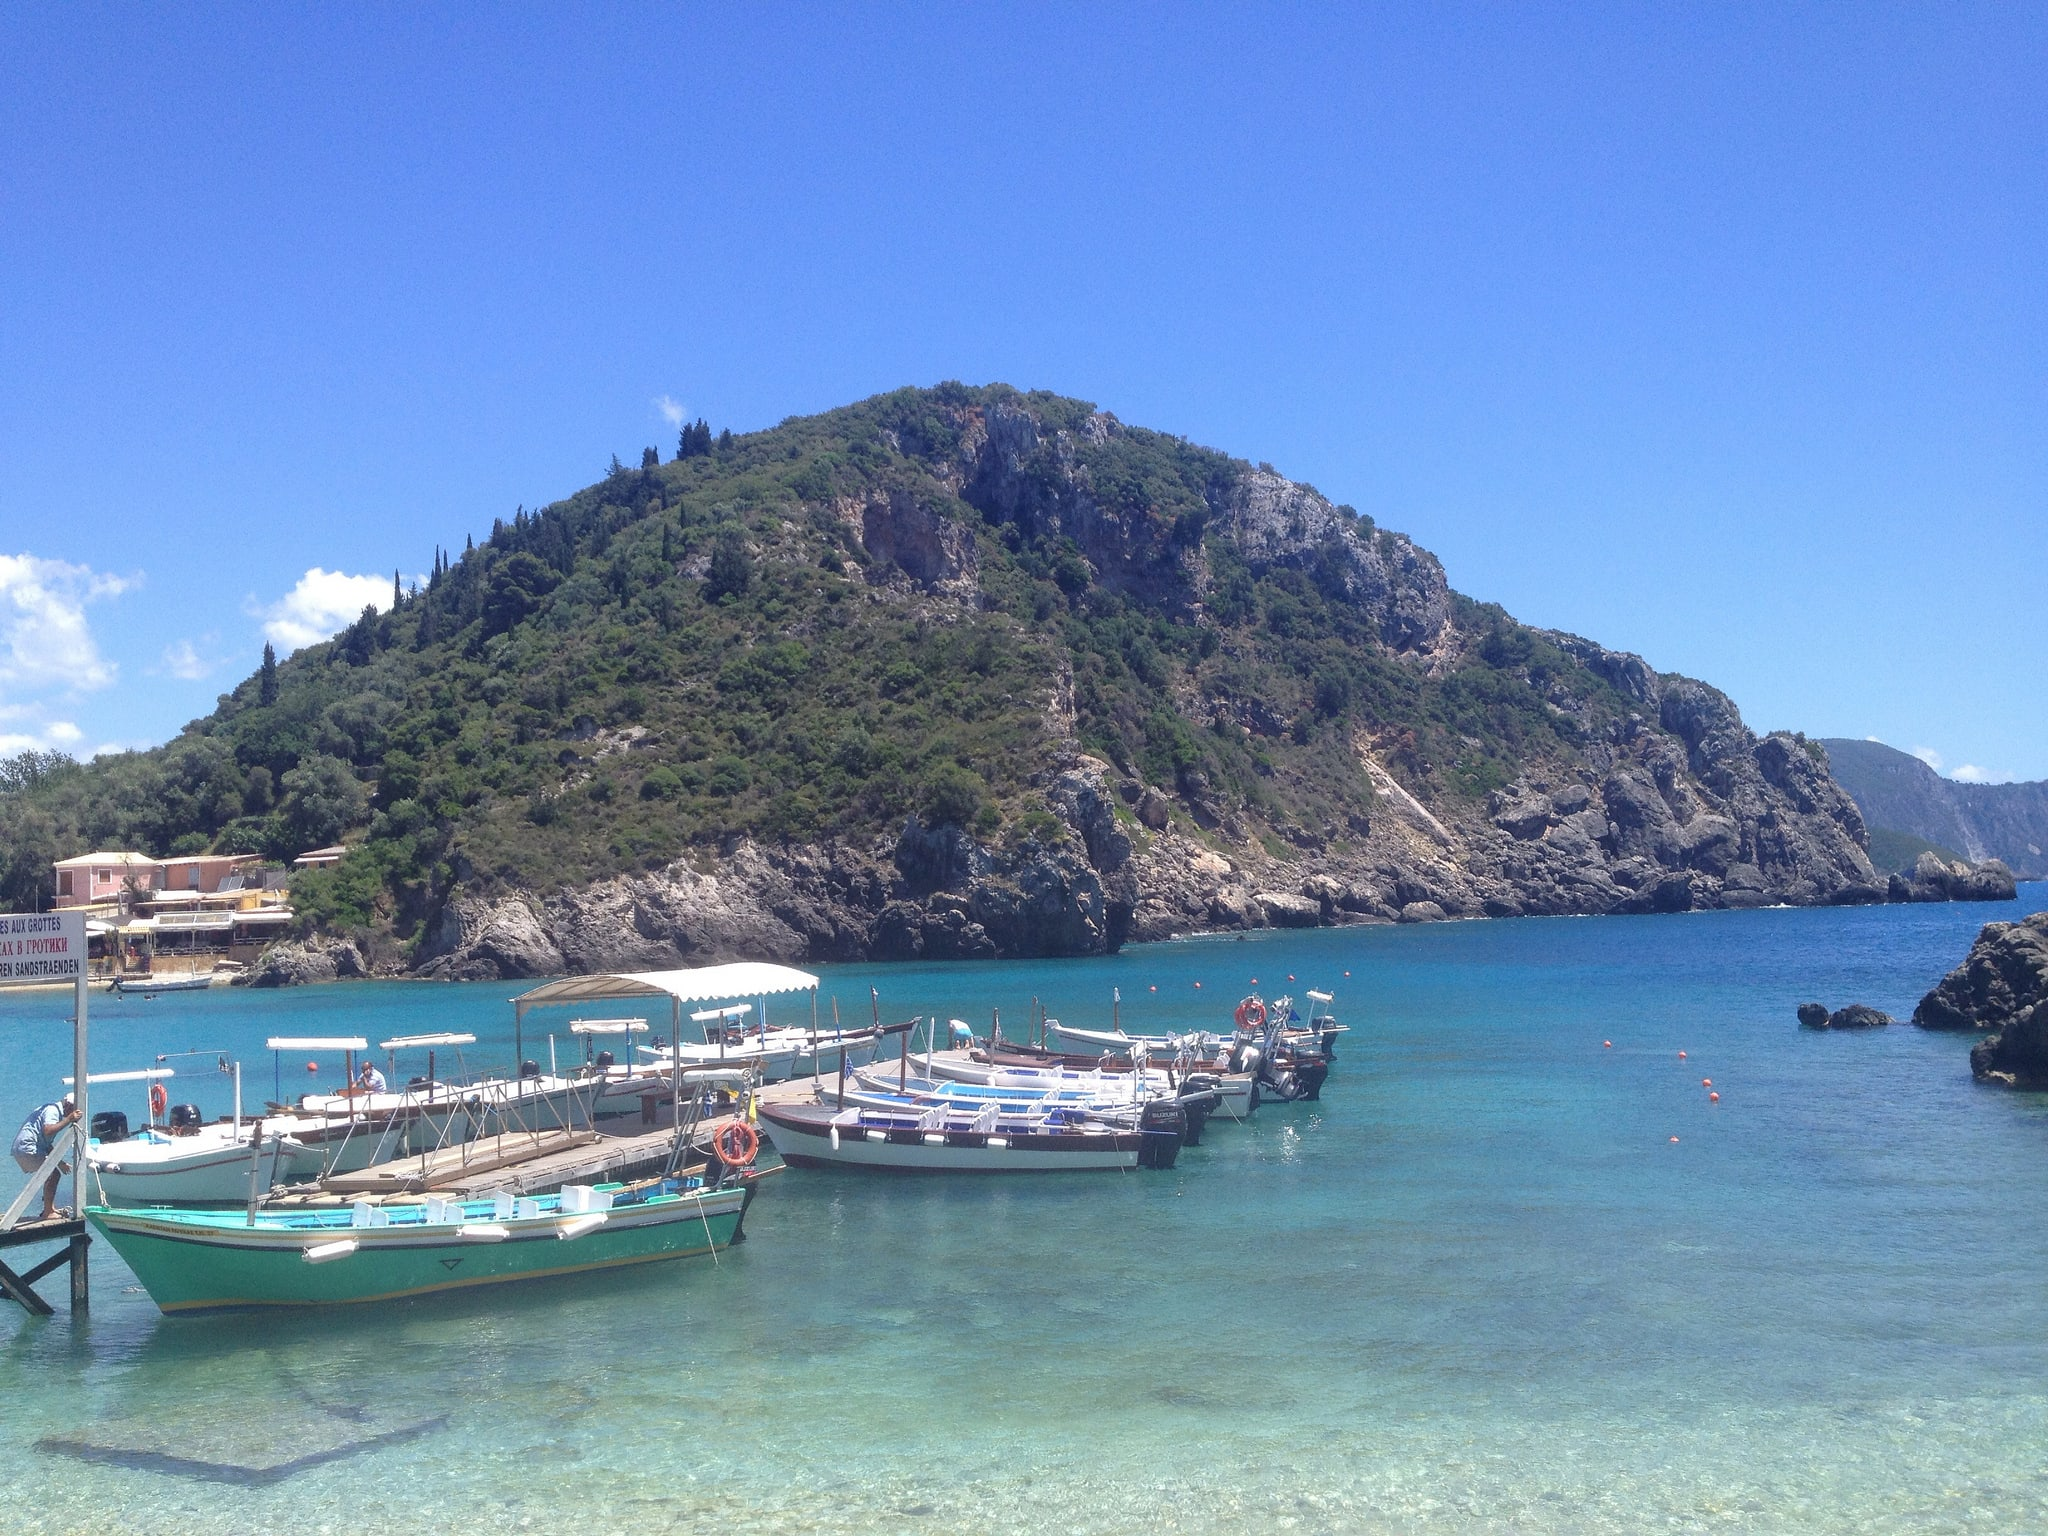 Boats in Corfu, Greece